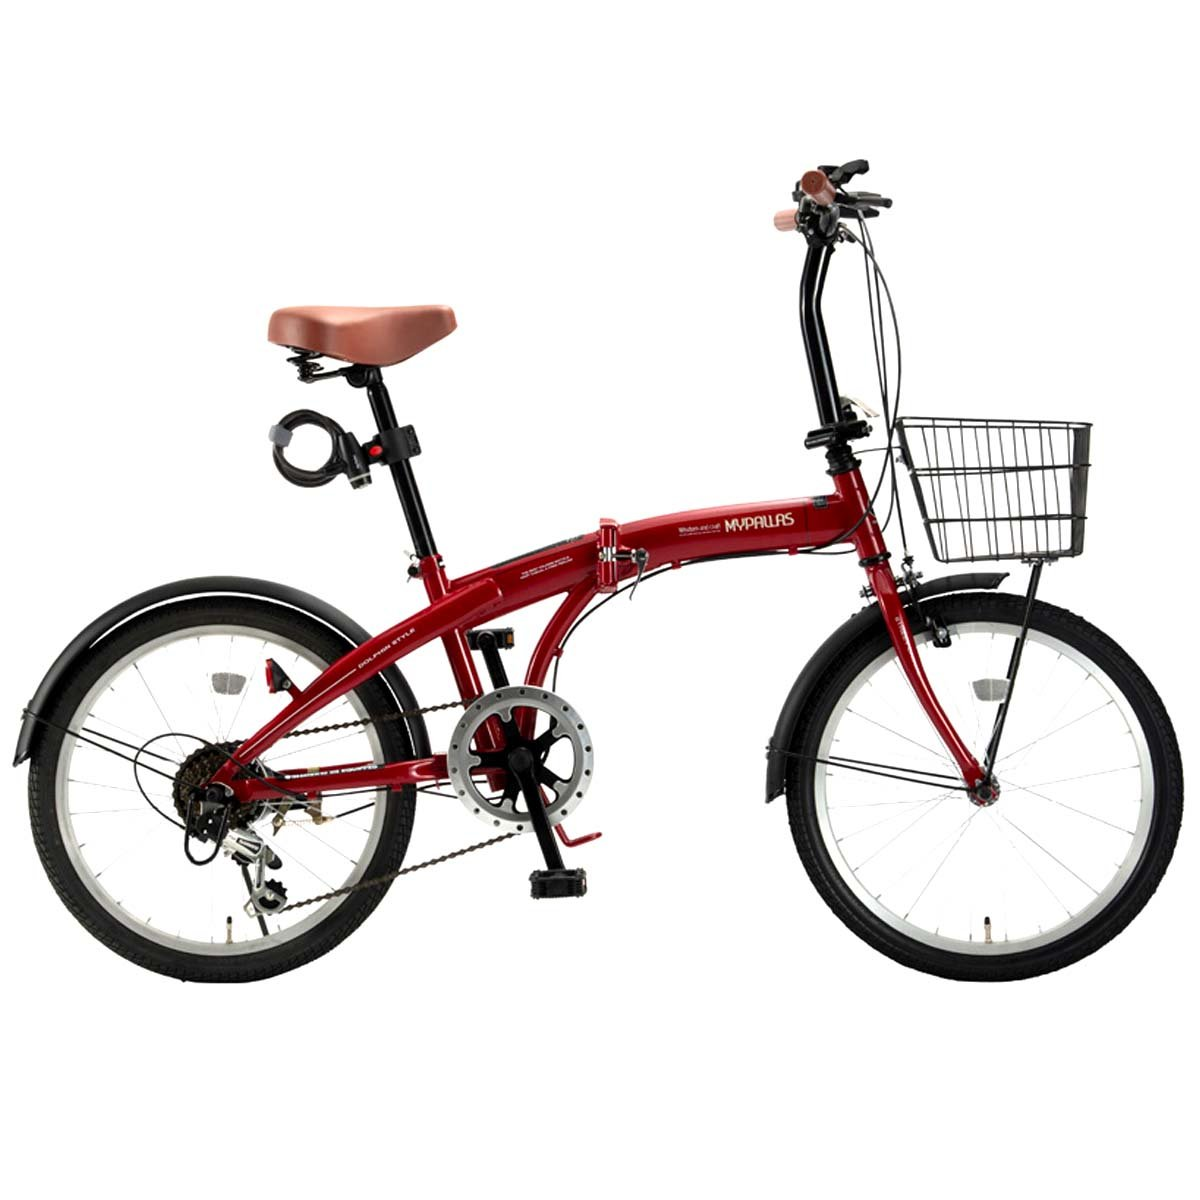 My Pallas(マイパラス) 折畳自転車20インチシマノ6段ギアバスケットライトカギ付 オールインワン HCS-01 B07DV92XY8 レッド レッド